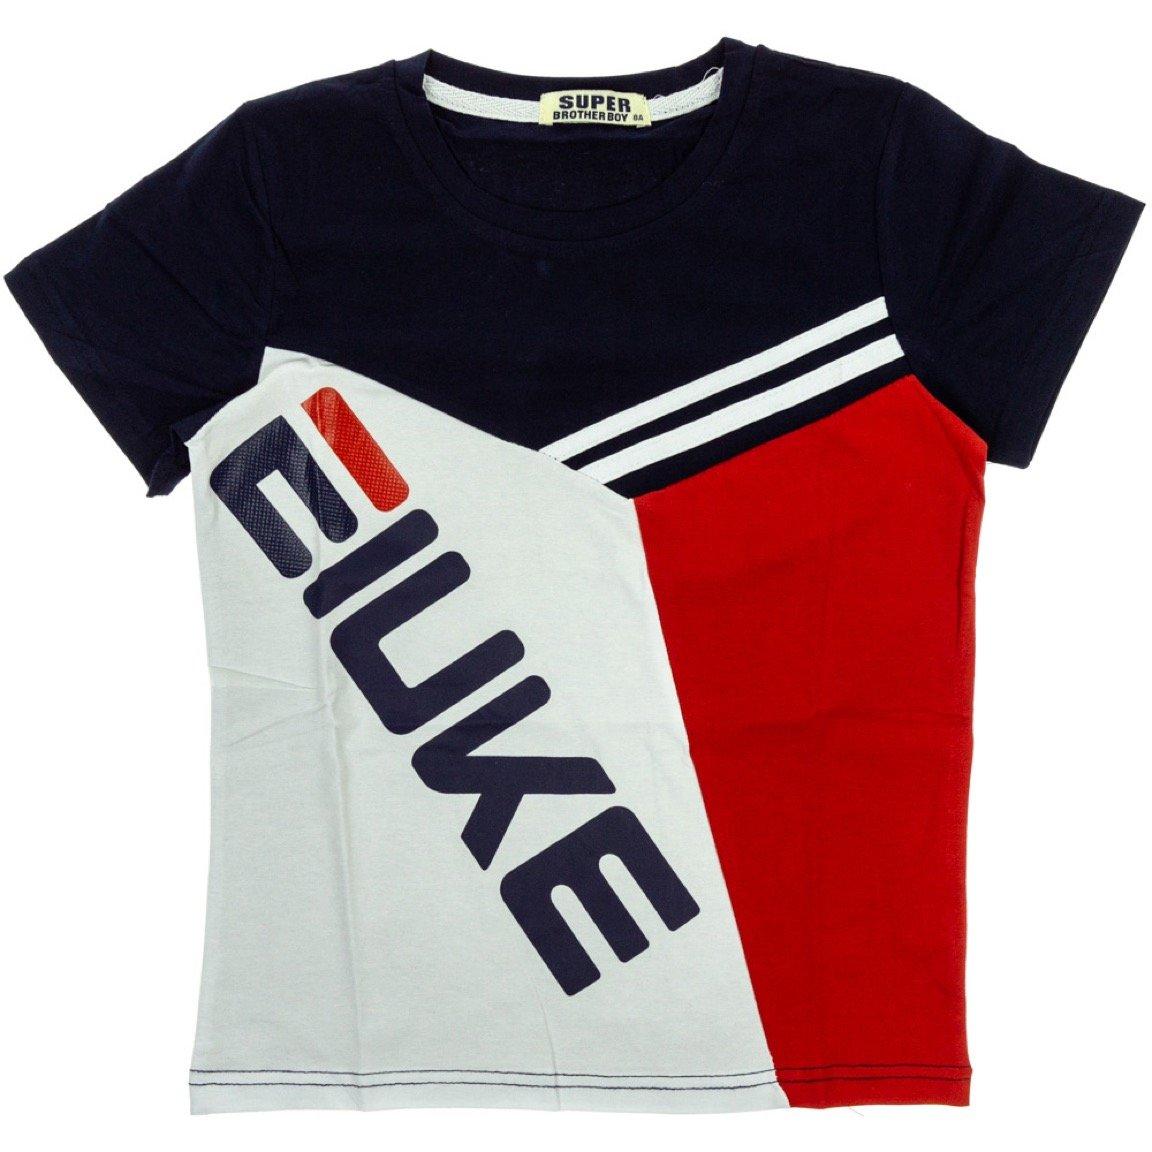 Super Brother παιδική μπλούζα «Dark Eiuke»